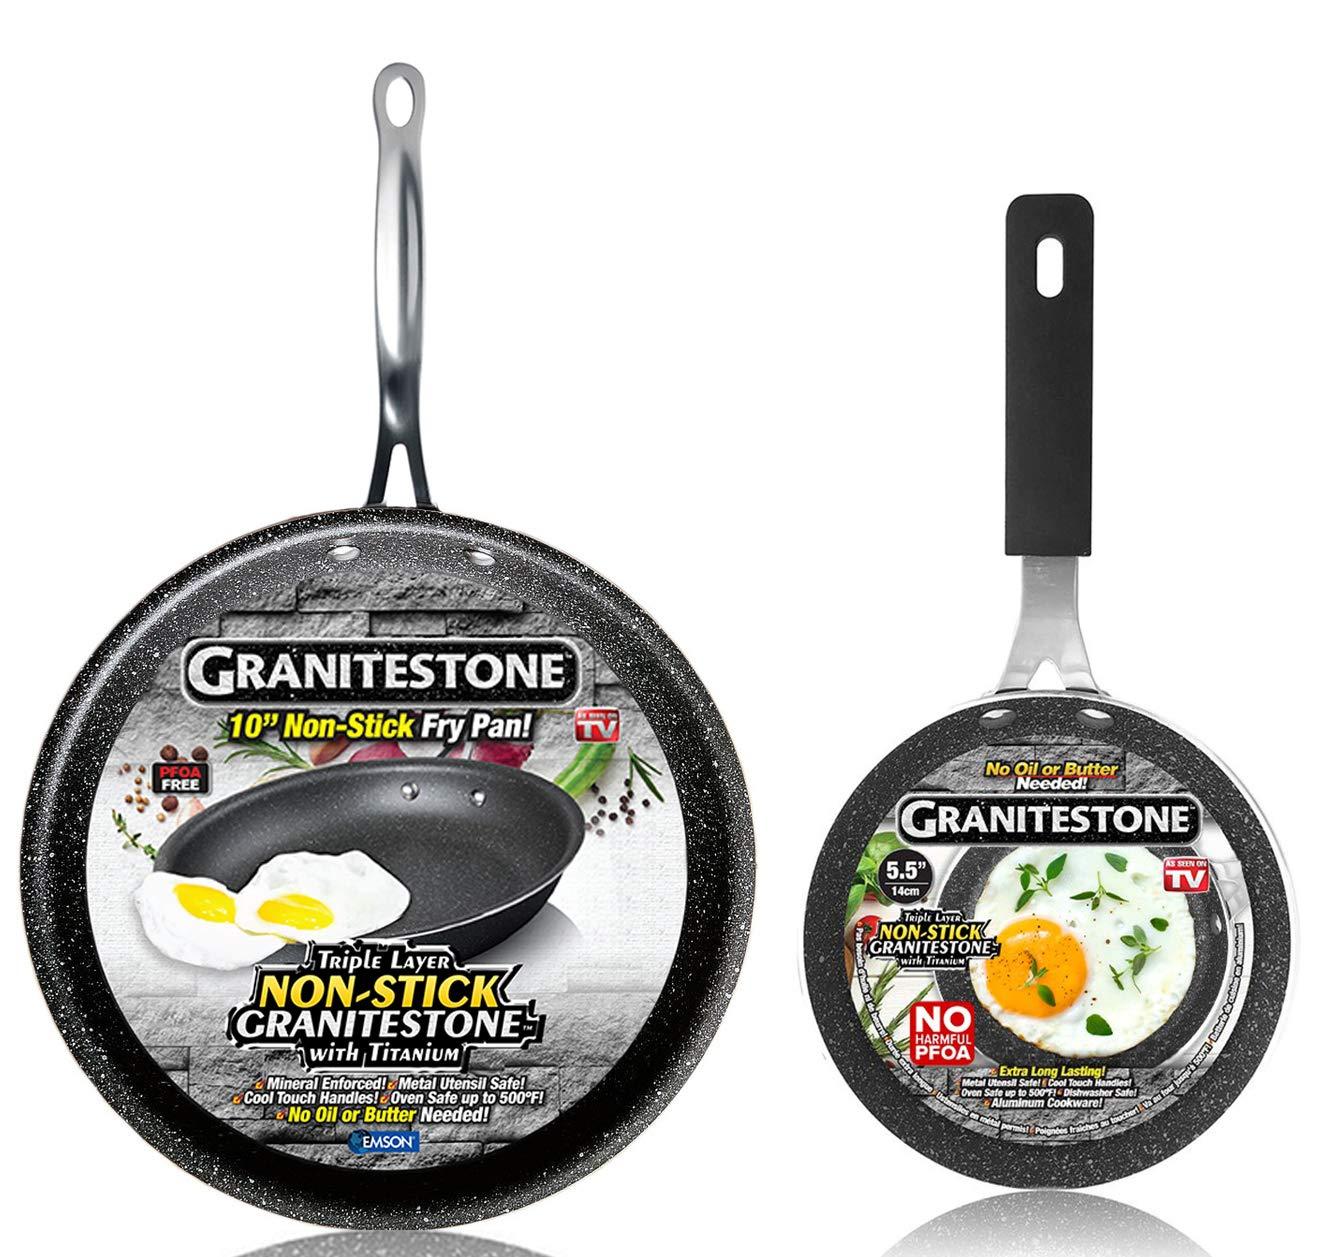 GRANITESTONE 10'' Frying Pan Skillet with 5.5'' Eggpan, Non-stick, No-warp, Mineral-enforced, PFOA-Free, Dishwasher-safe As Seen On TV by GRANITESTONE